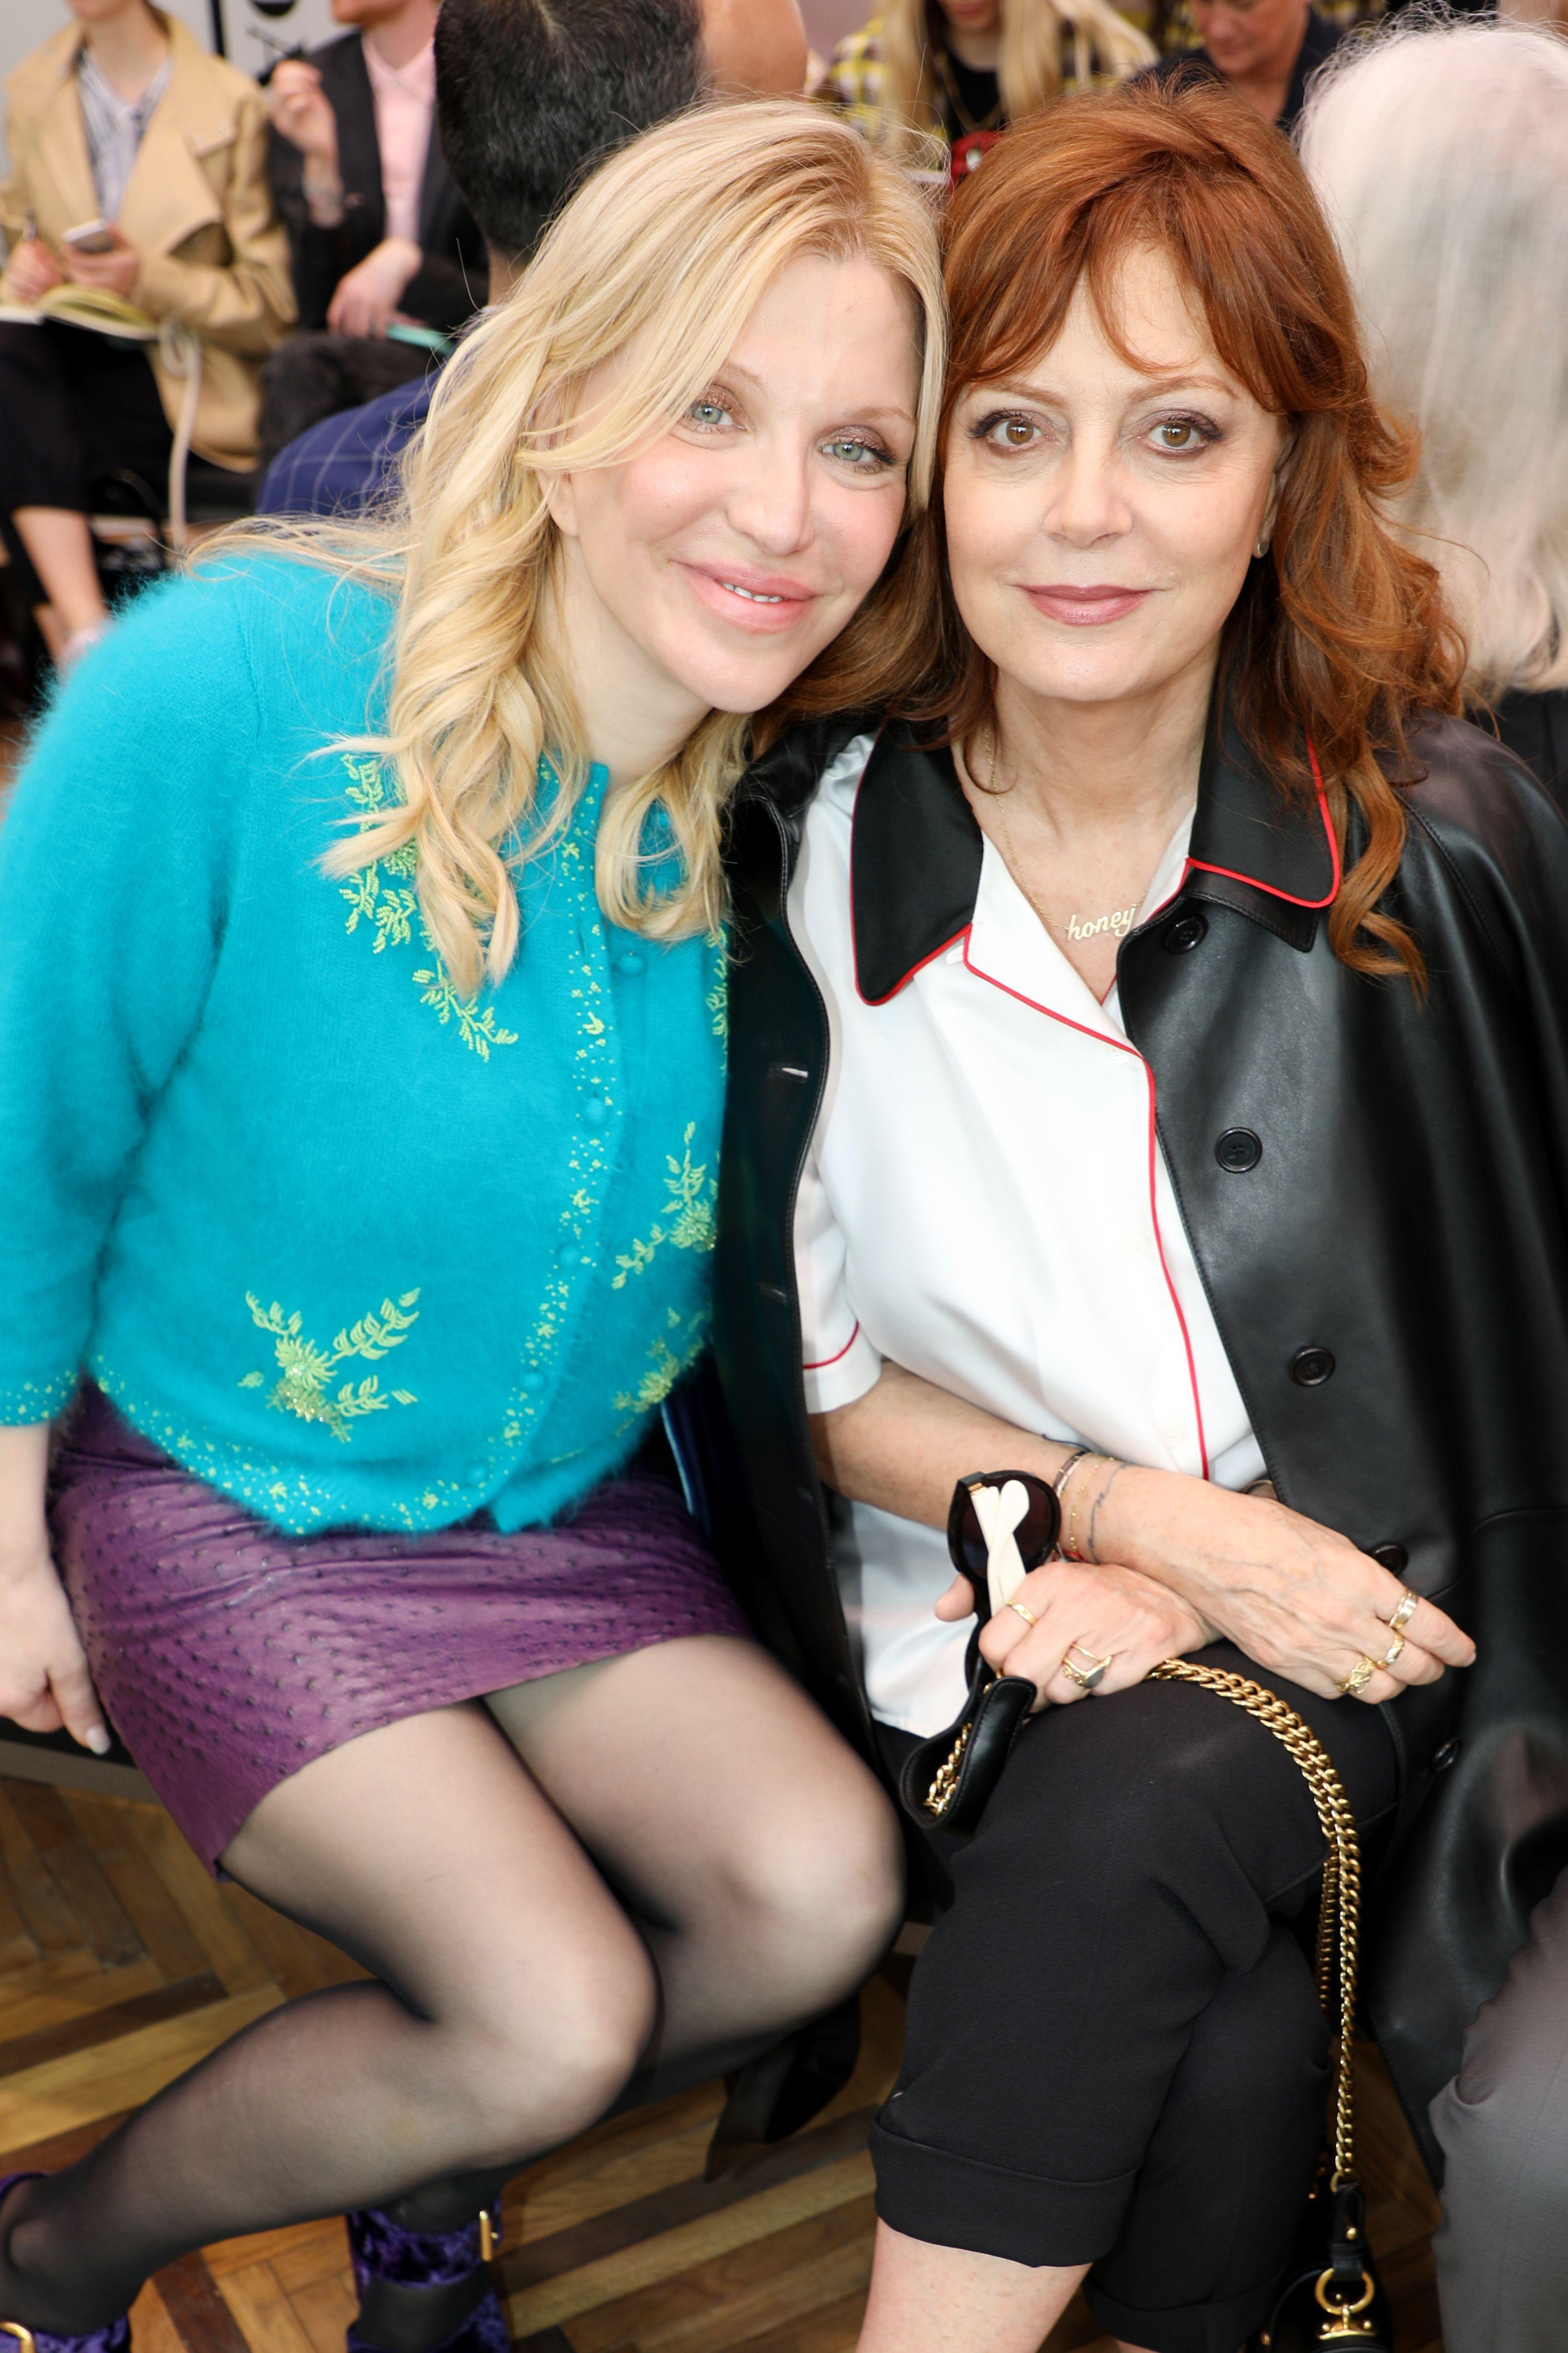 Courtney Love and Susan Sarandon